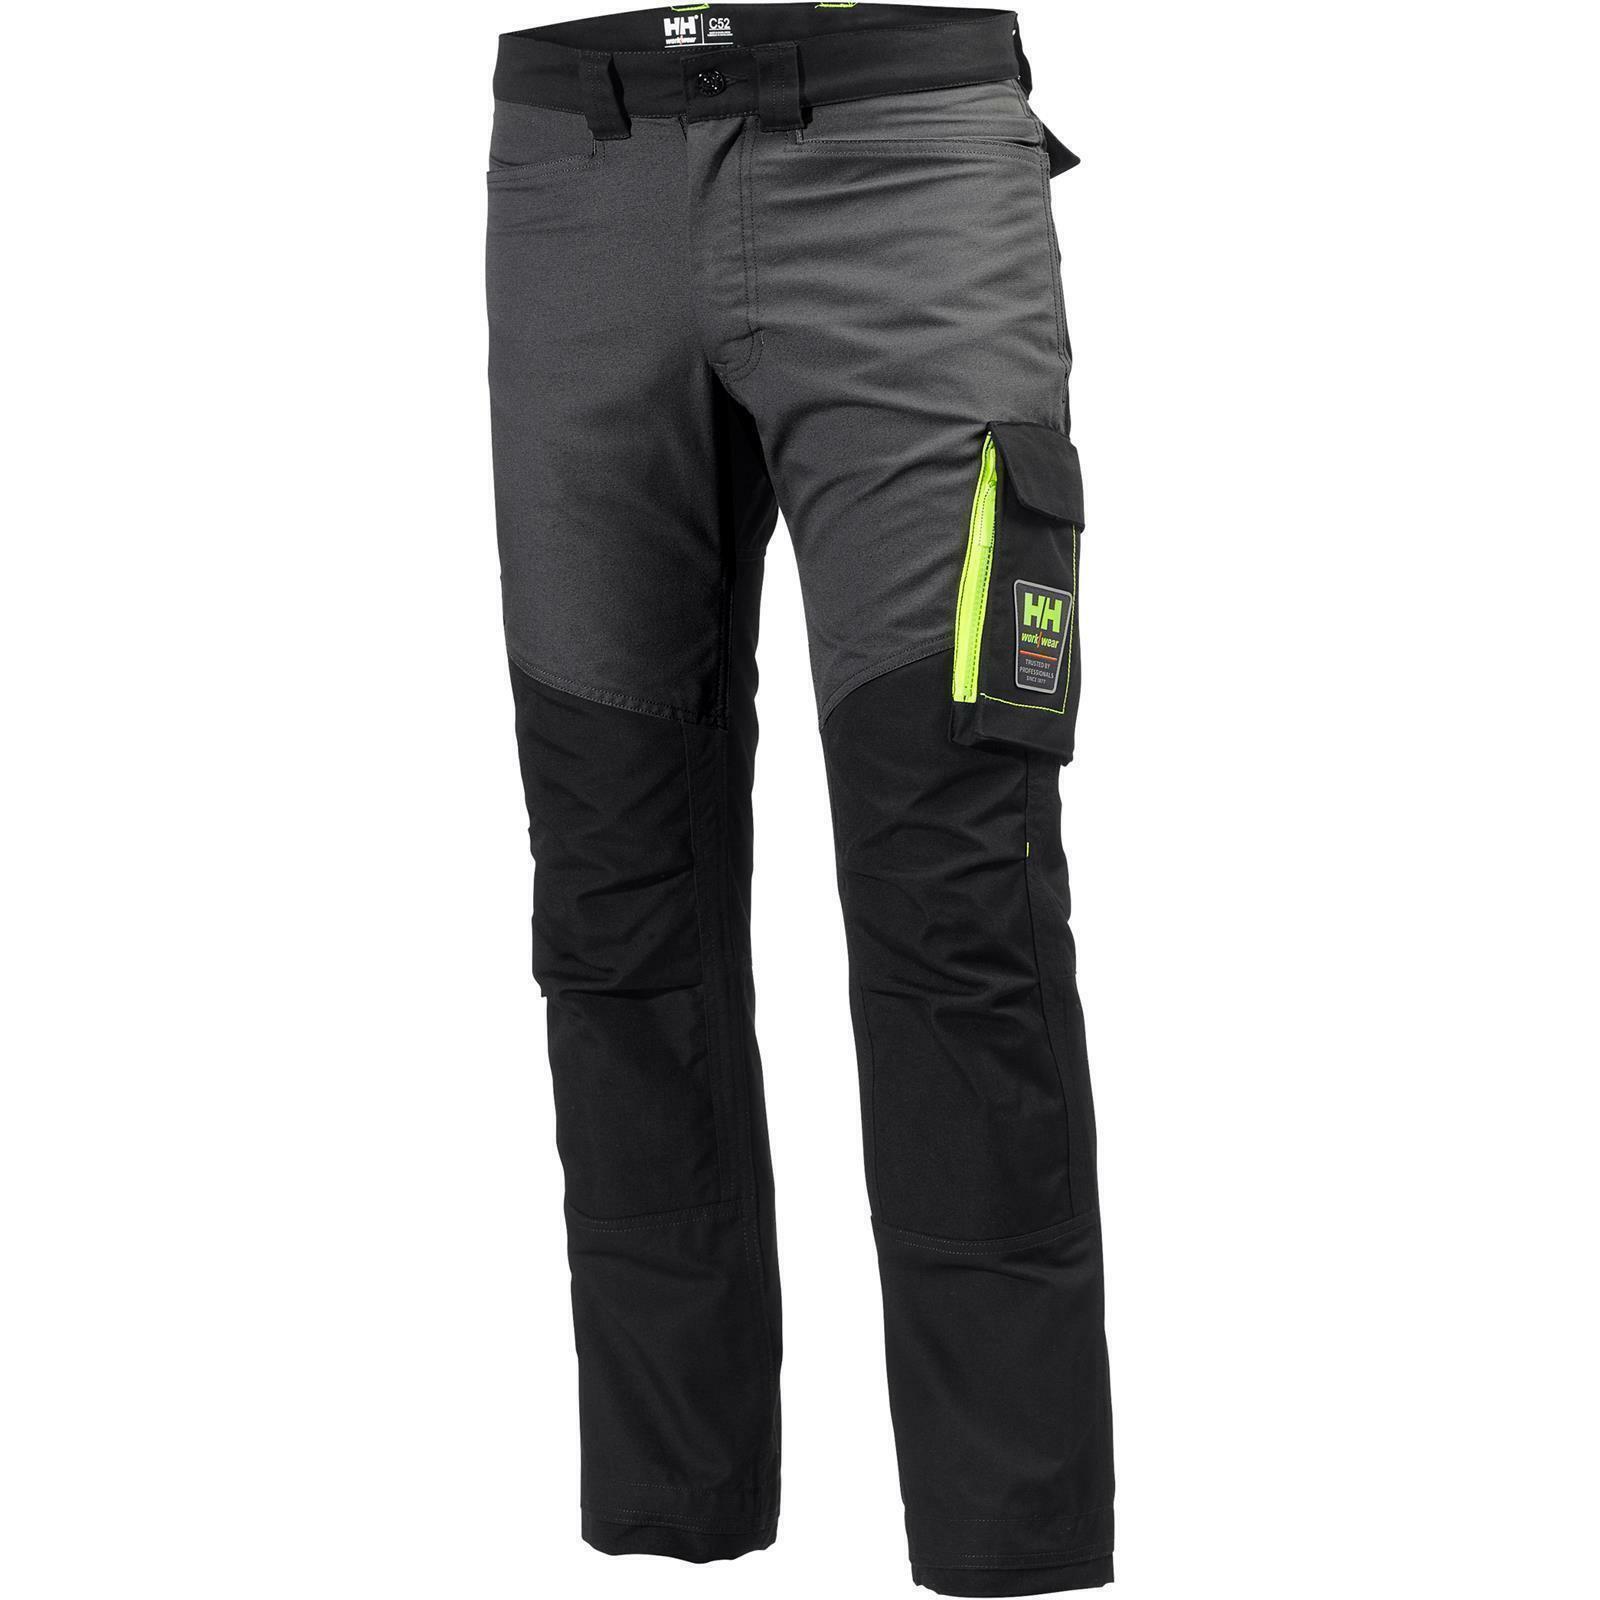 HH Aker federale Pantaloni Pantaloni Pantaloni Nero Grigio scuro c59298